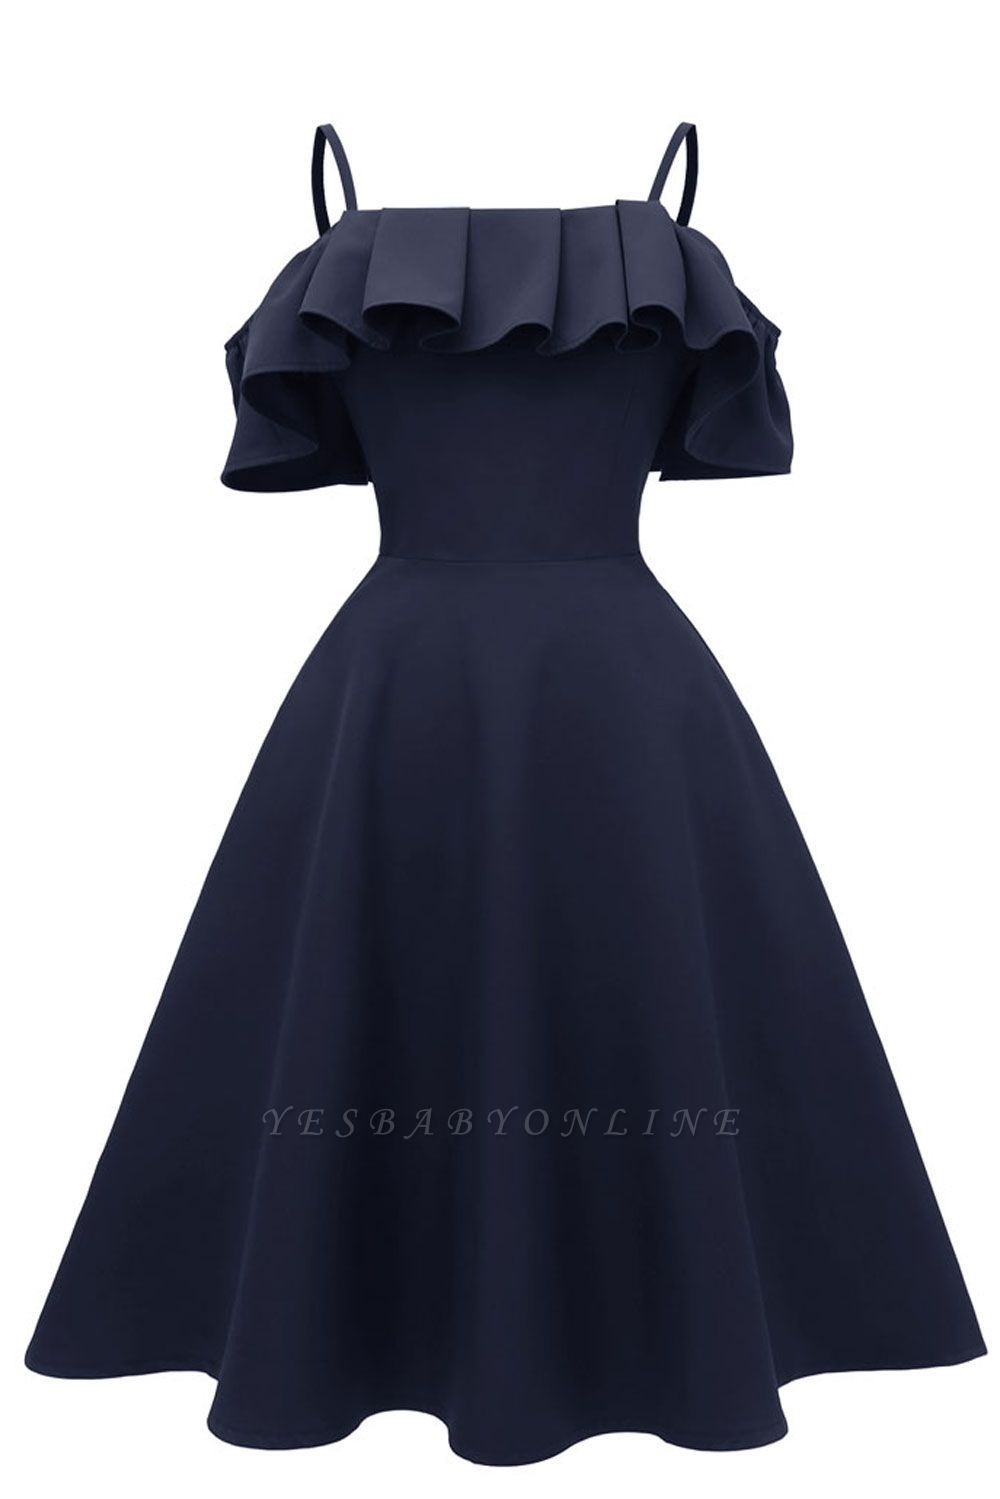 Lovely Spaghetti Straps Cascading Ruffles Vintage Short Dresses Vintage Short Dress Short Dresses Vintage Dresses [ 1499 x 1000 Pixel ]